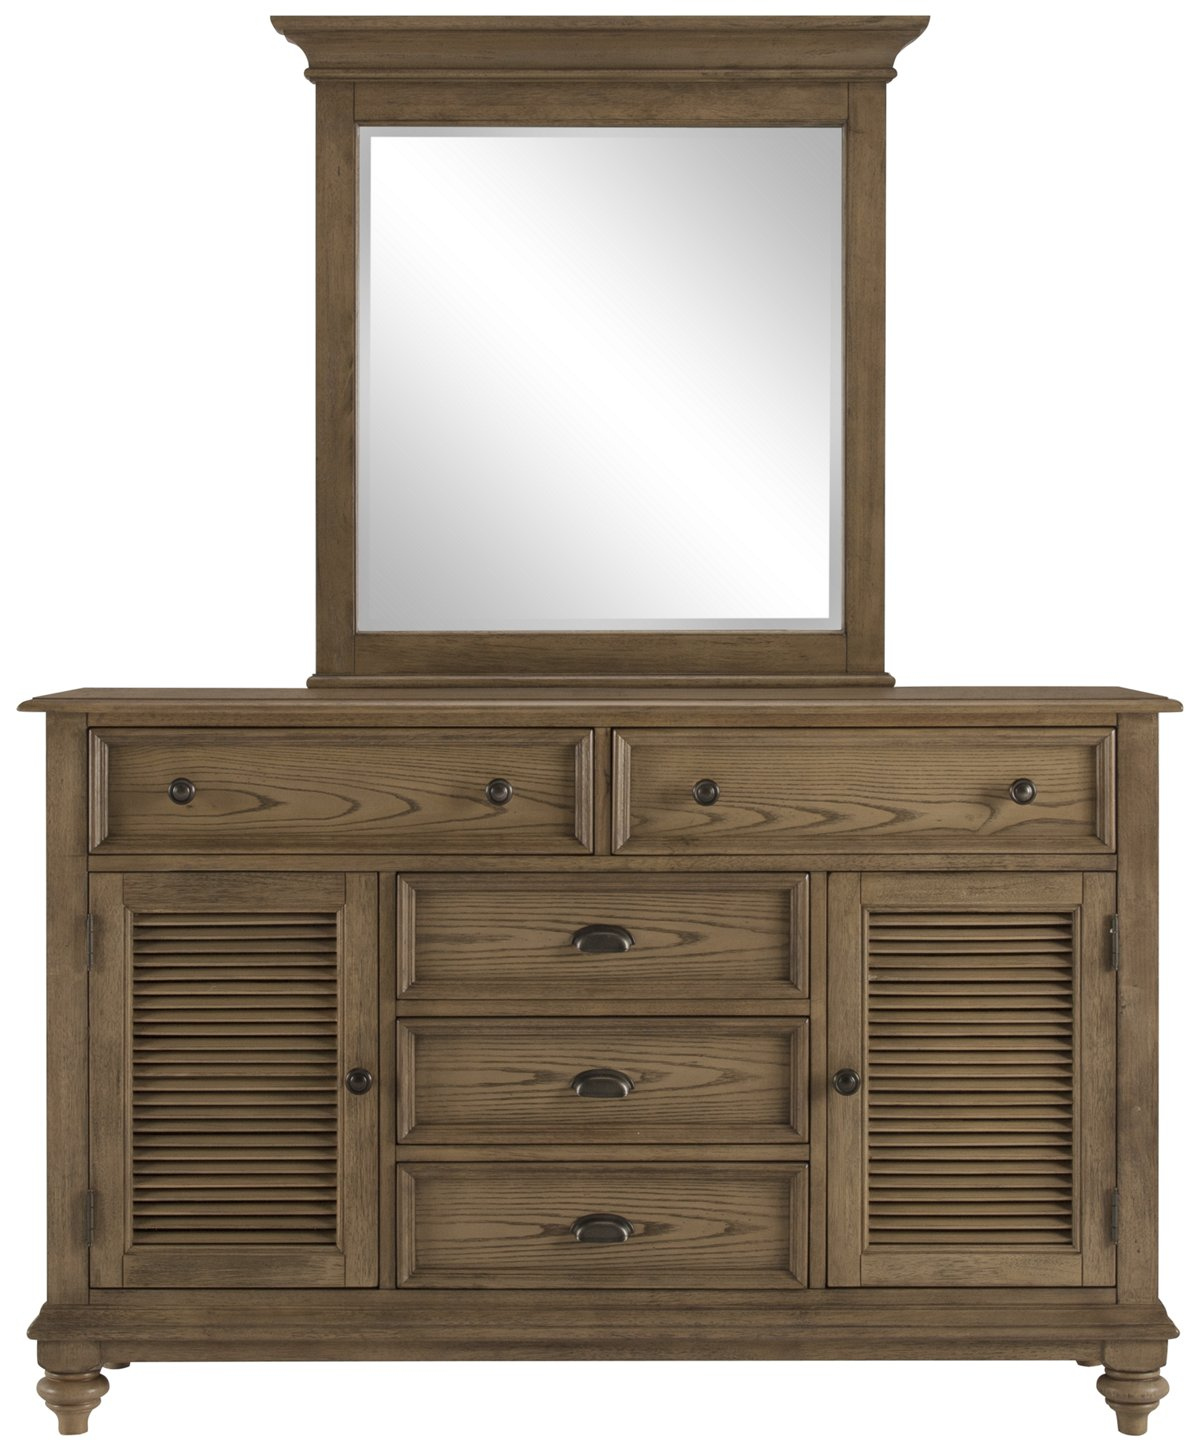 Coventry Light Tone Wood Dresser & Mirror